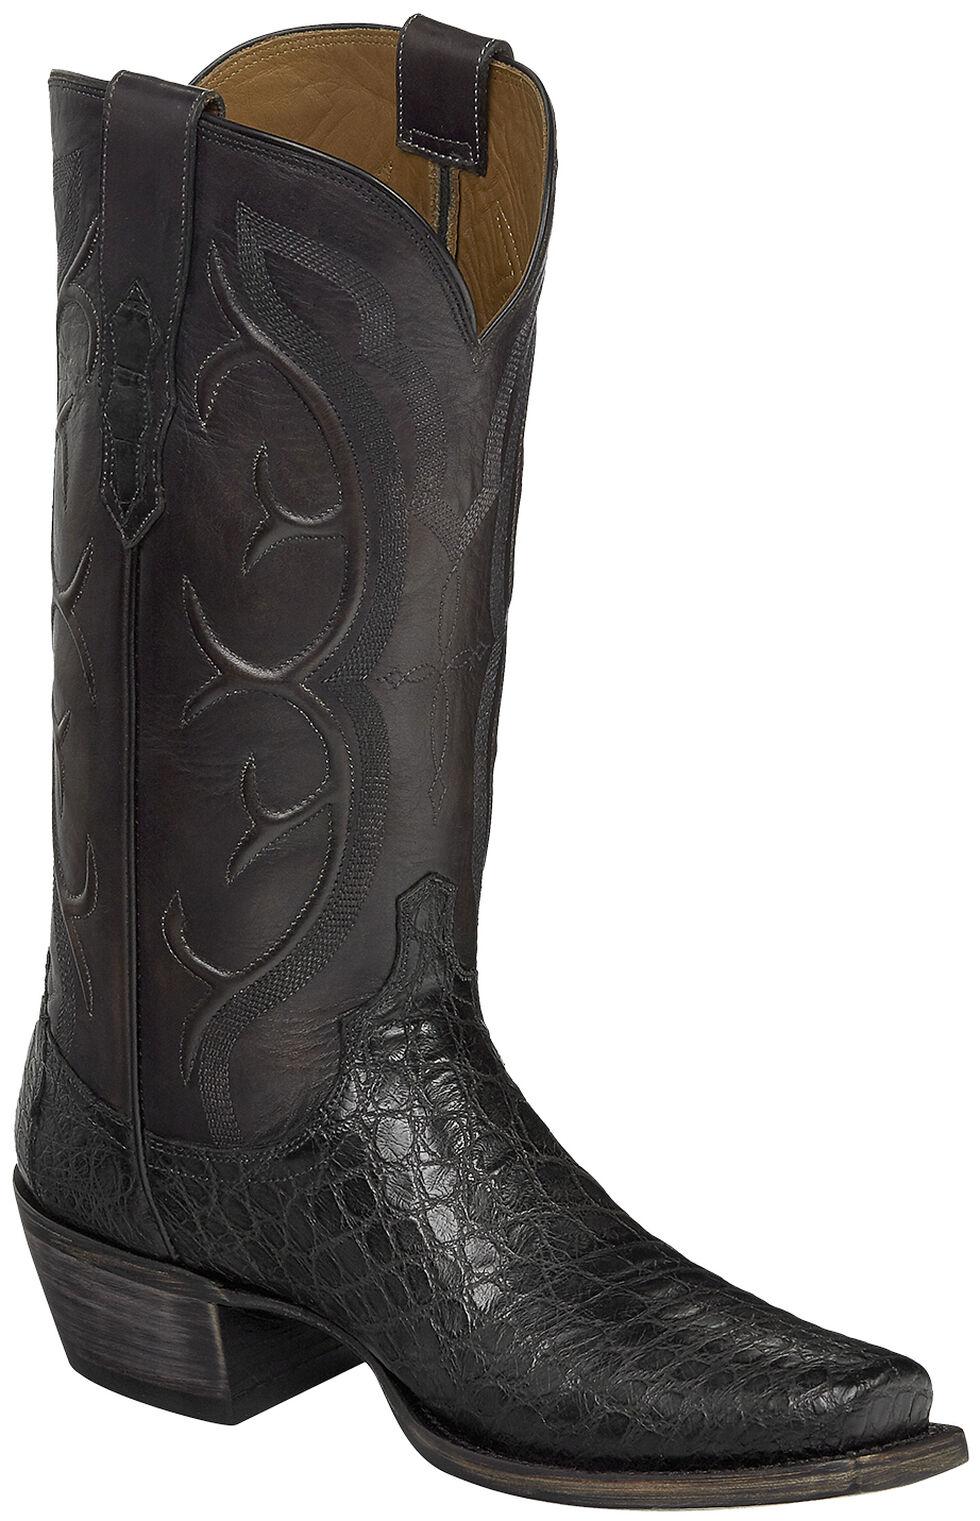 Lucchese Handmade Dark Grey Van Giant Gator Cowboy Boots - Square Toe  , Dark Grey, hi-res